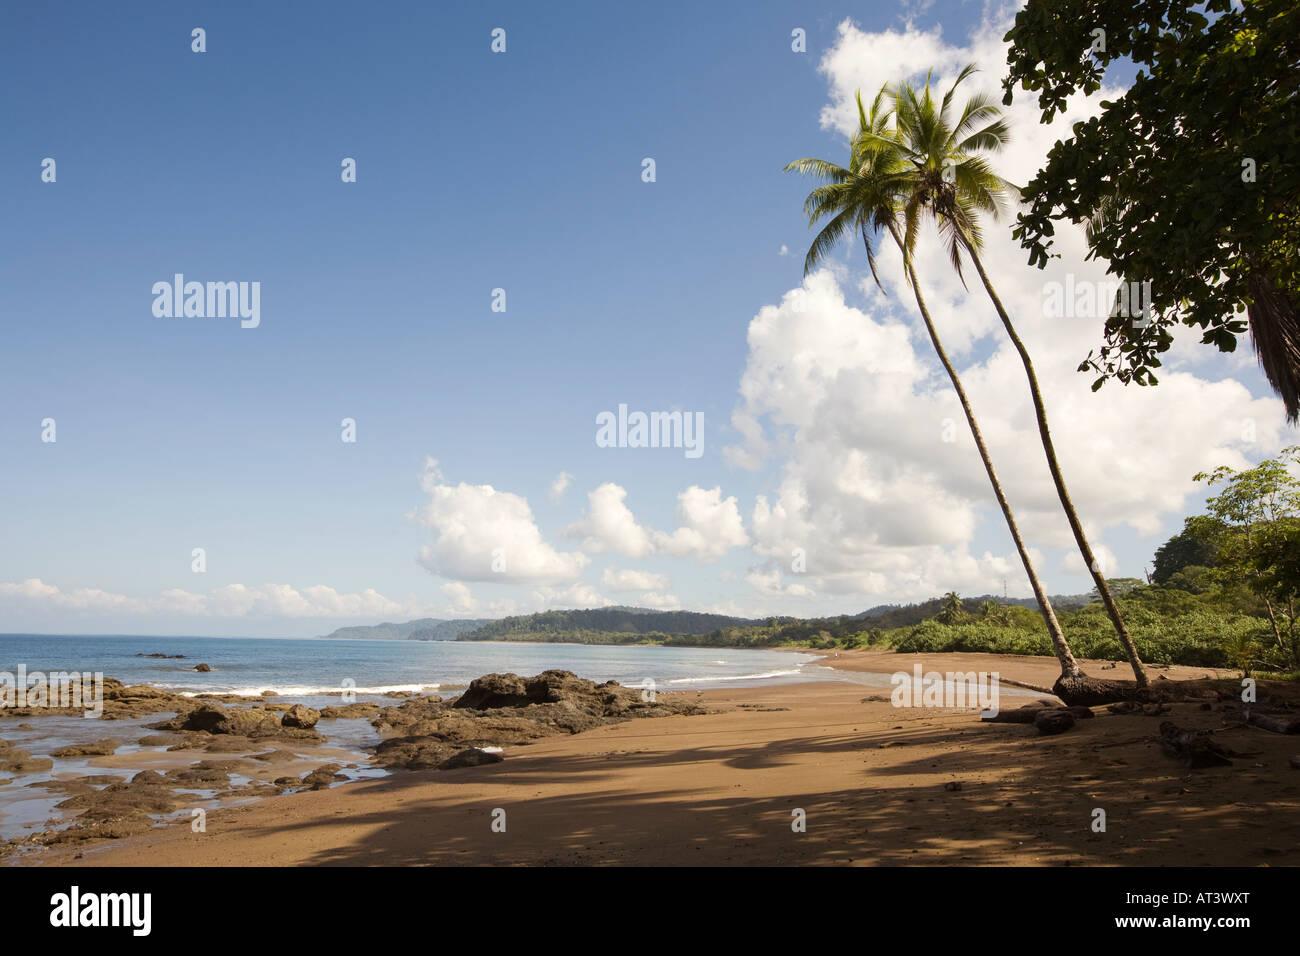 Costa Rica Osa Peninsula Agujitas beach Drake River entering Drake Bay - Stock Image